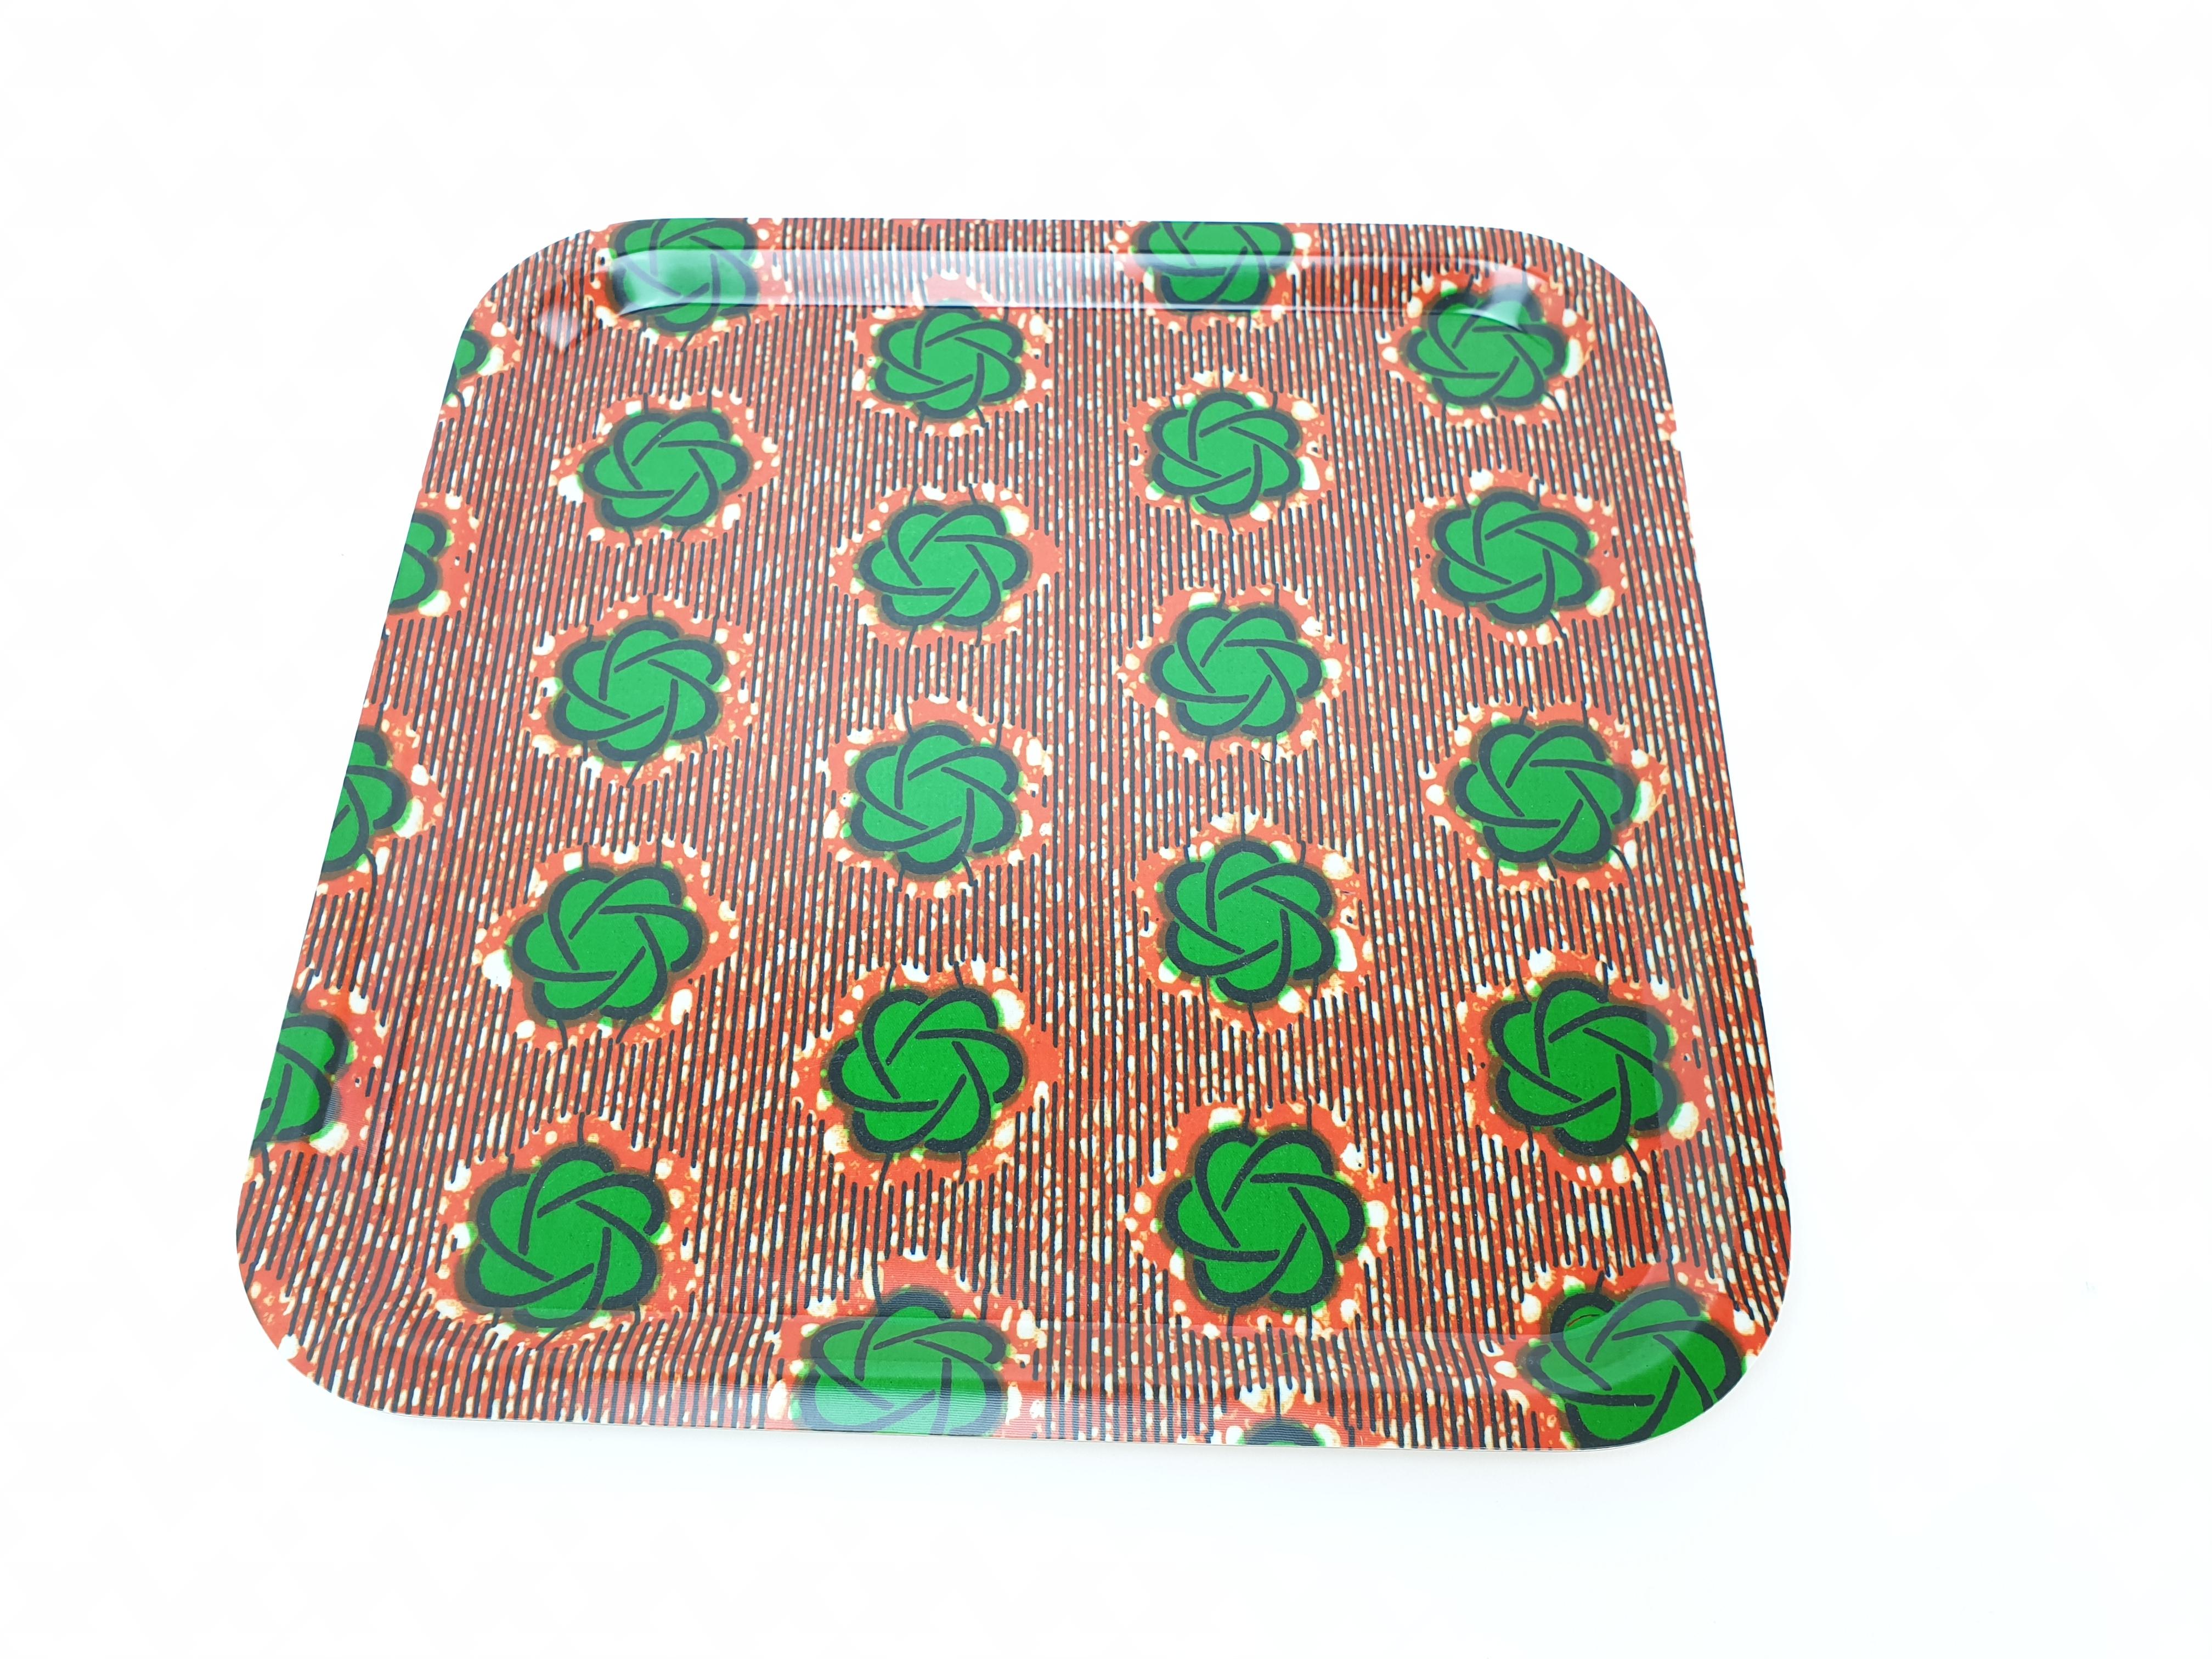 Bricka Fyrkantig, afrikanskt tyg